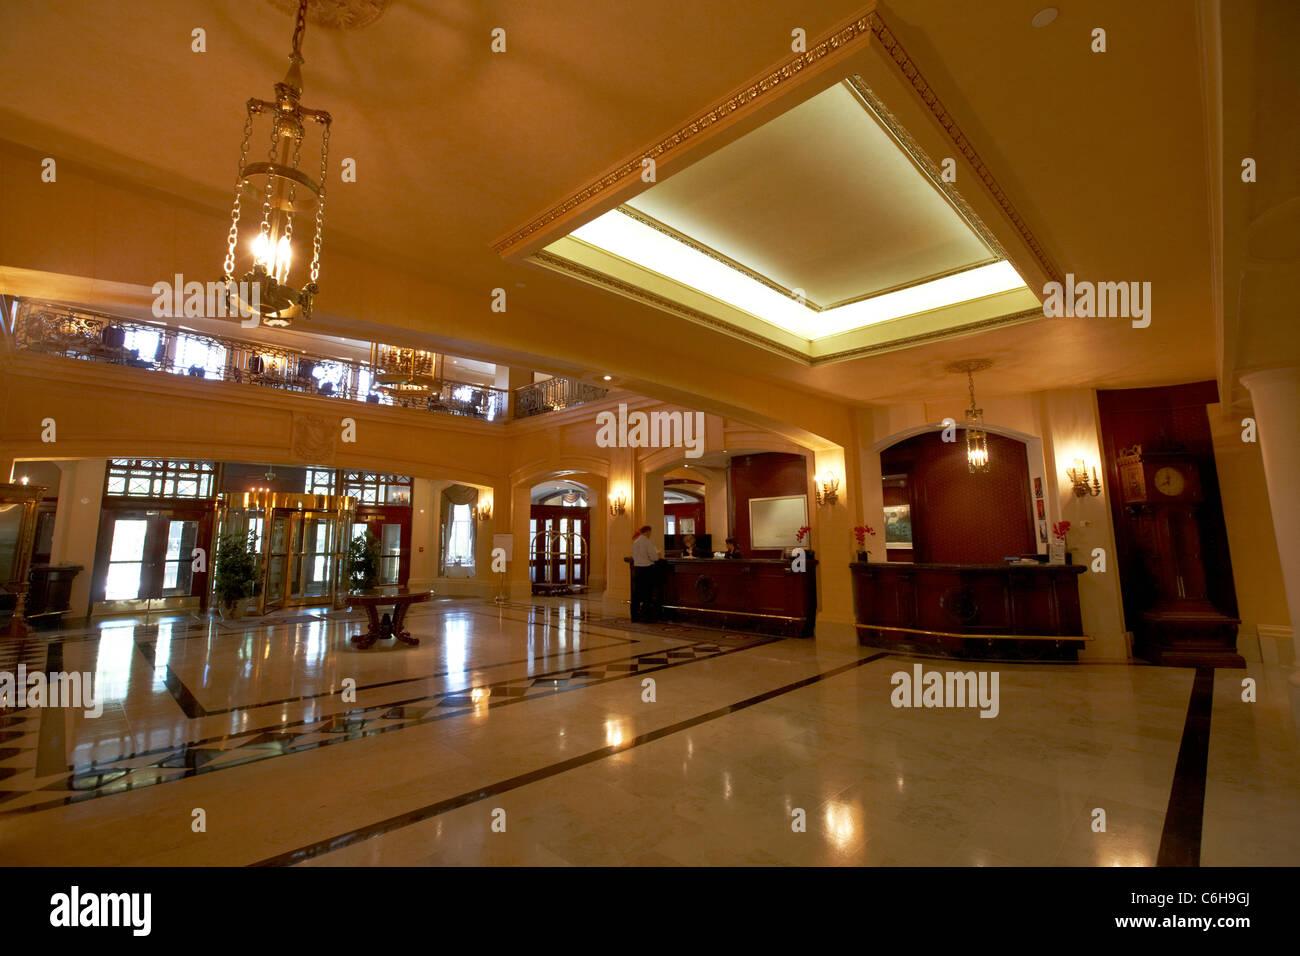 Foyer Of Hotel : Fort garry hotel stock photos